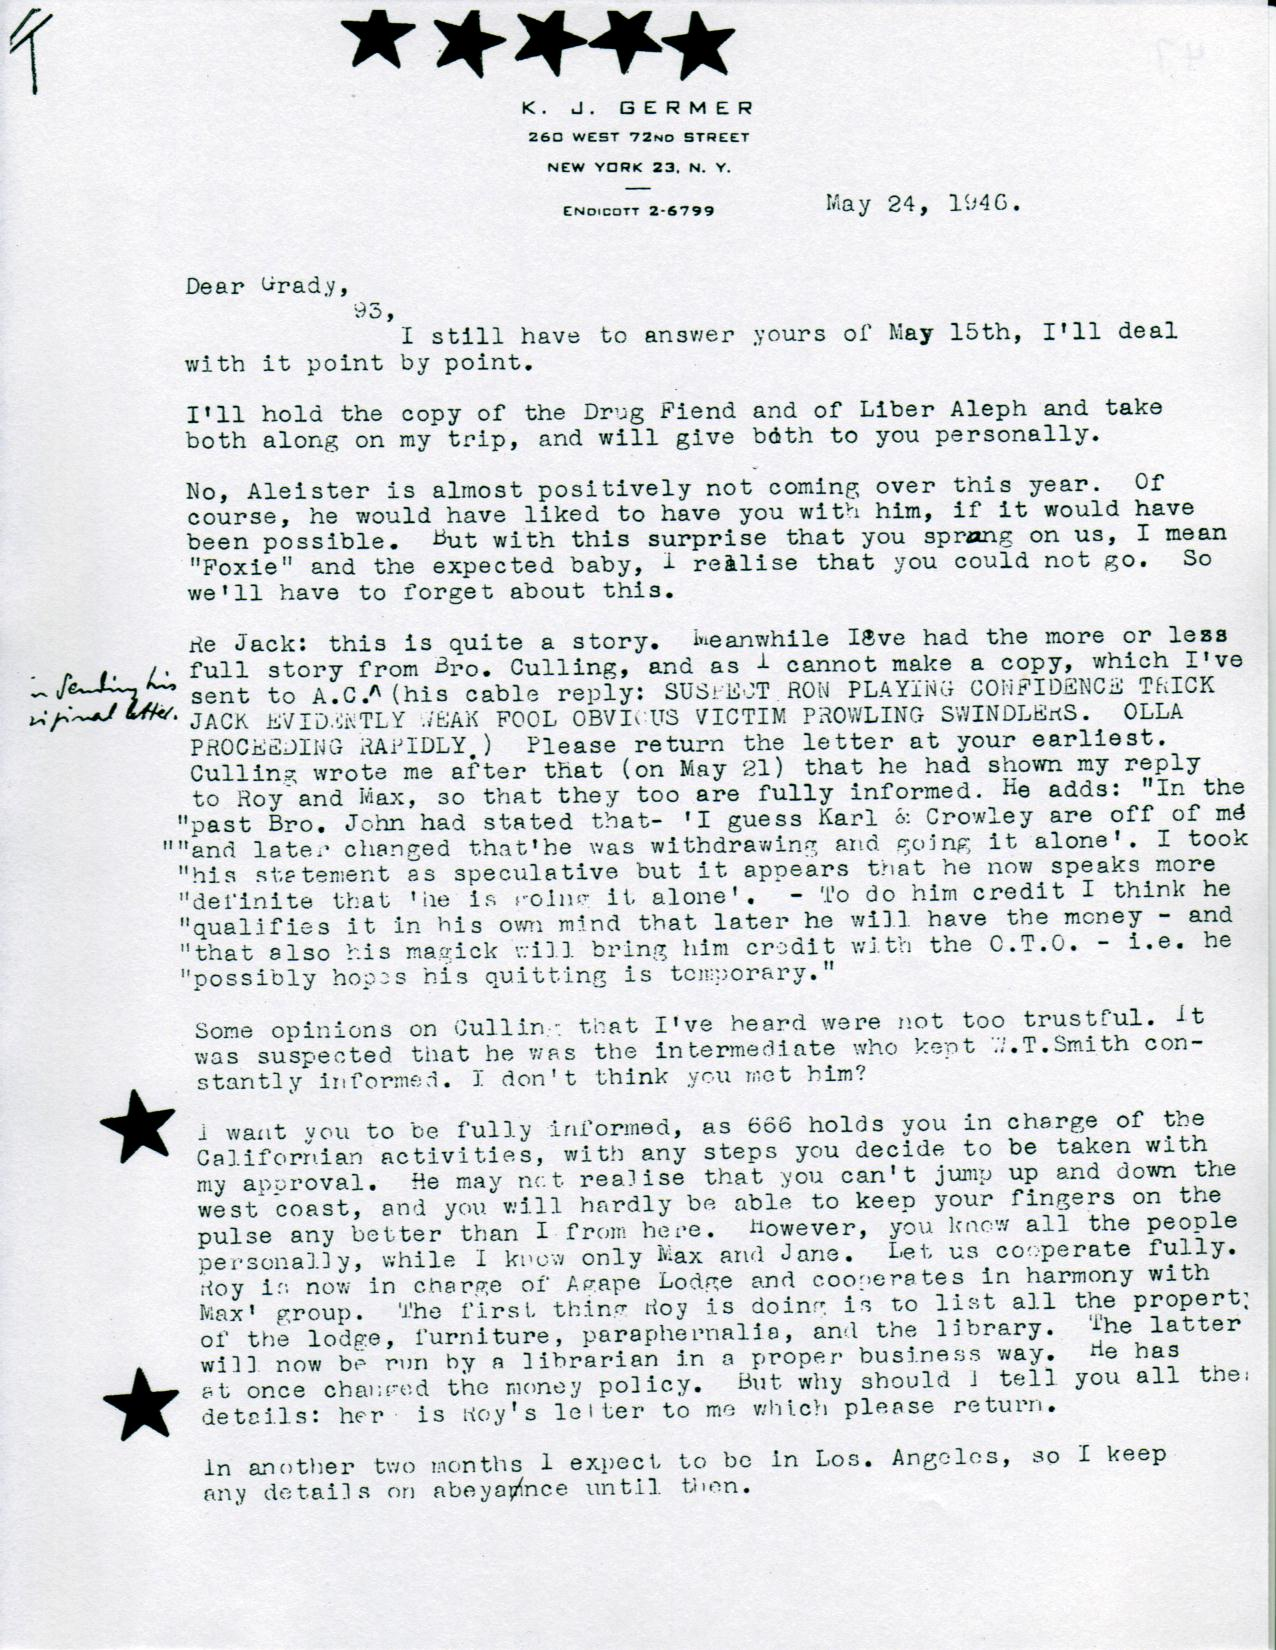 (05/24/1946) Karl Germer to Grady McMurtry (pg.1)